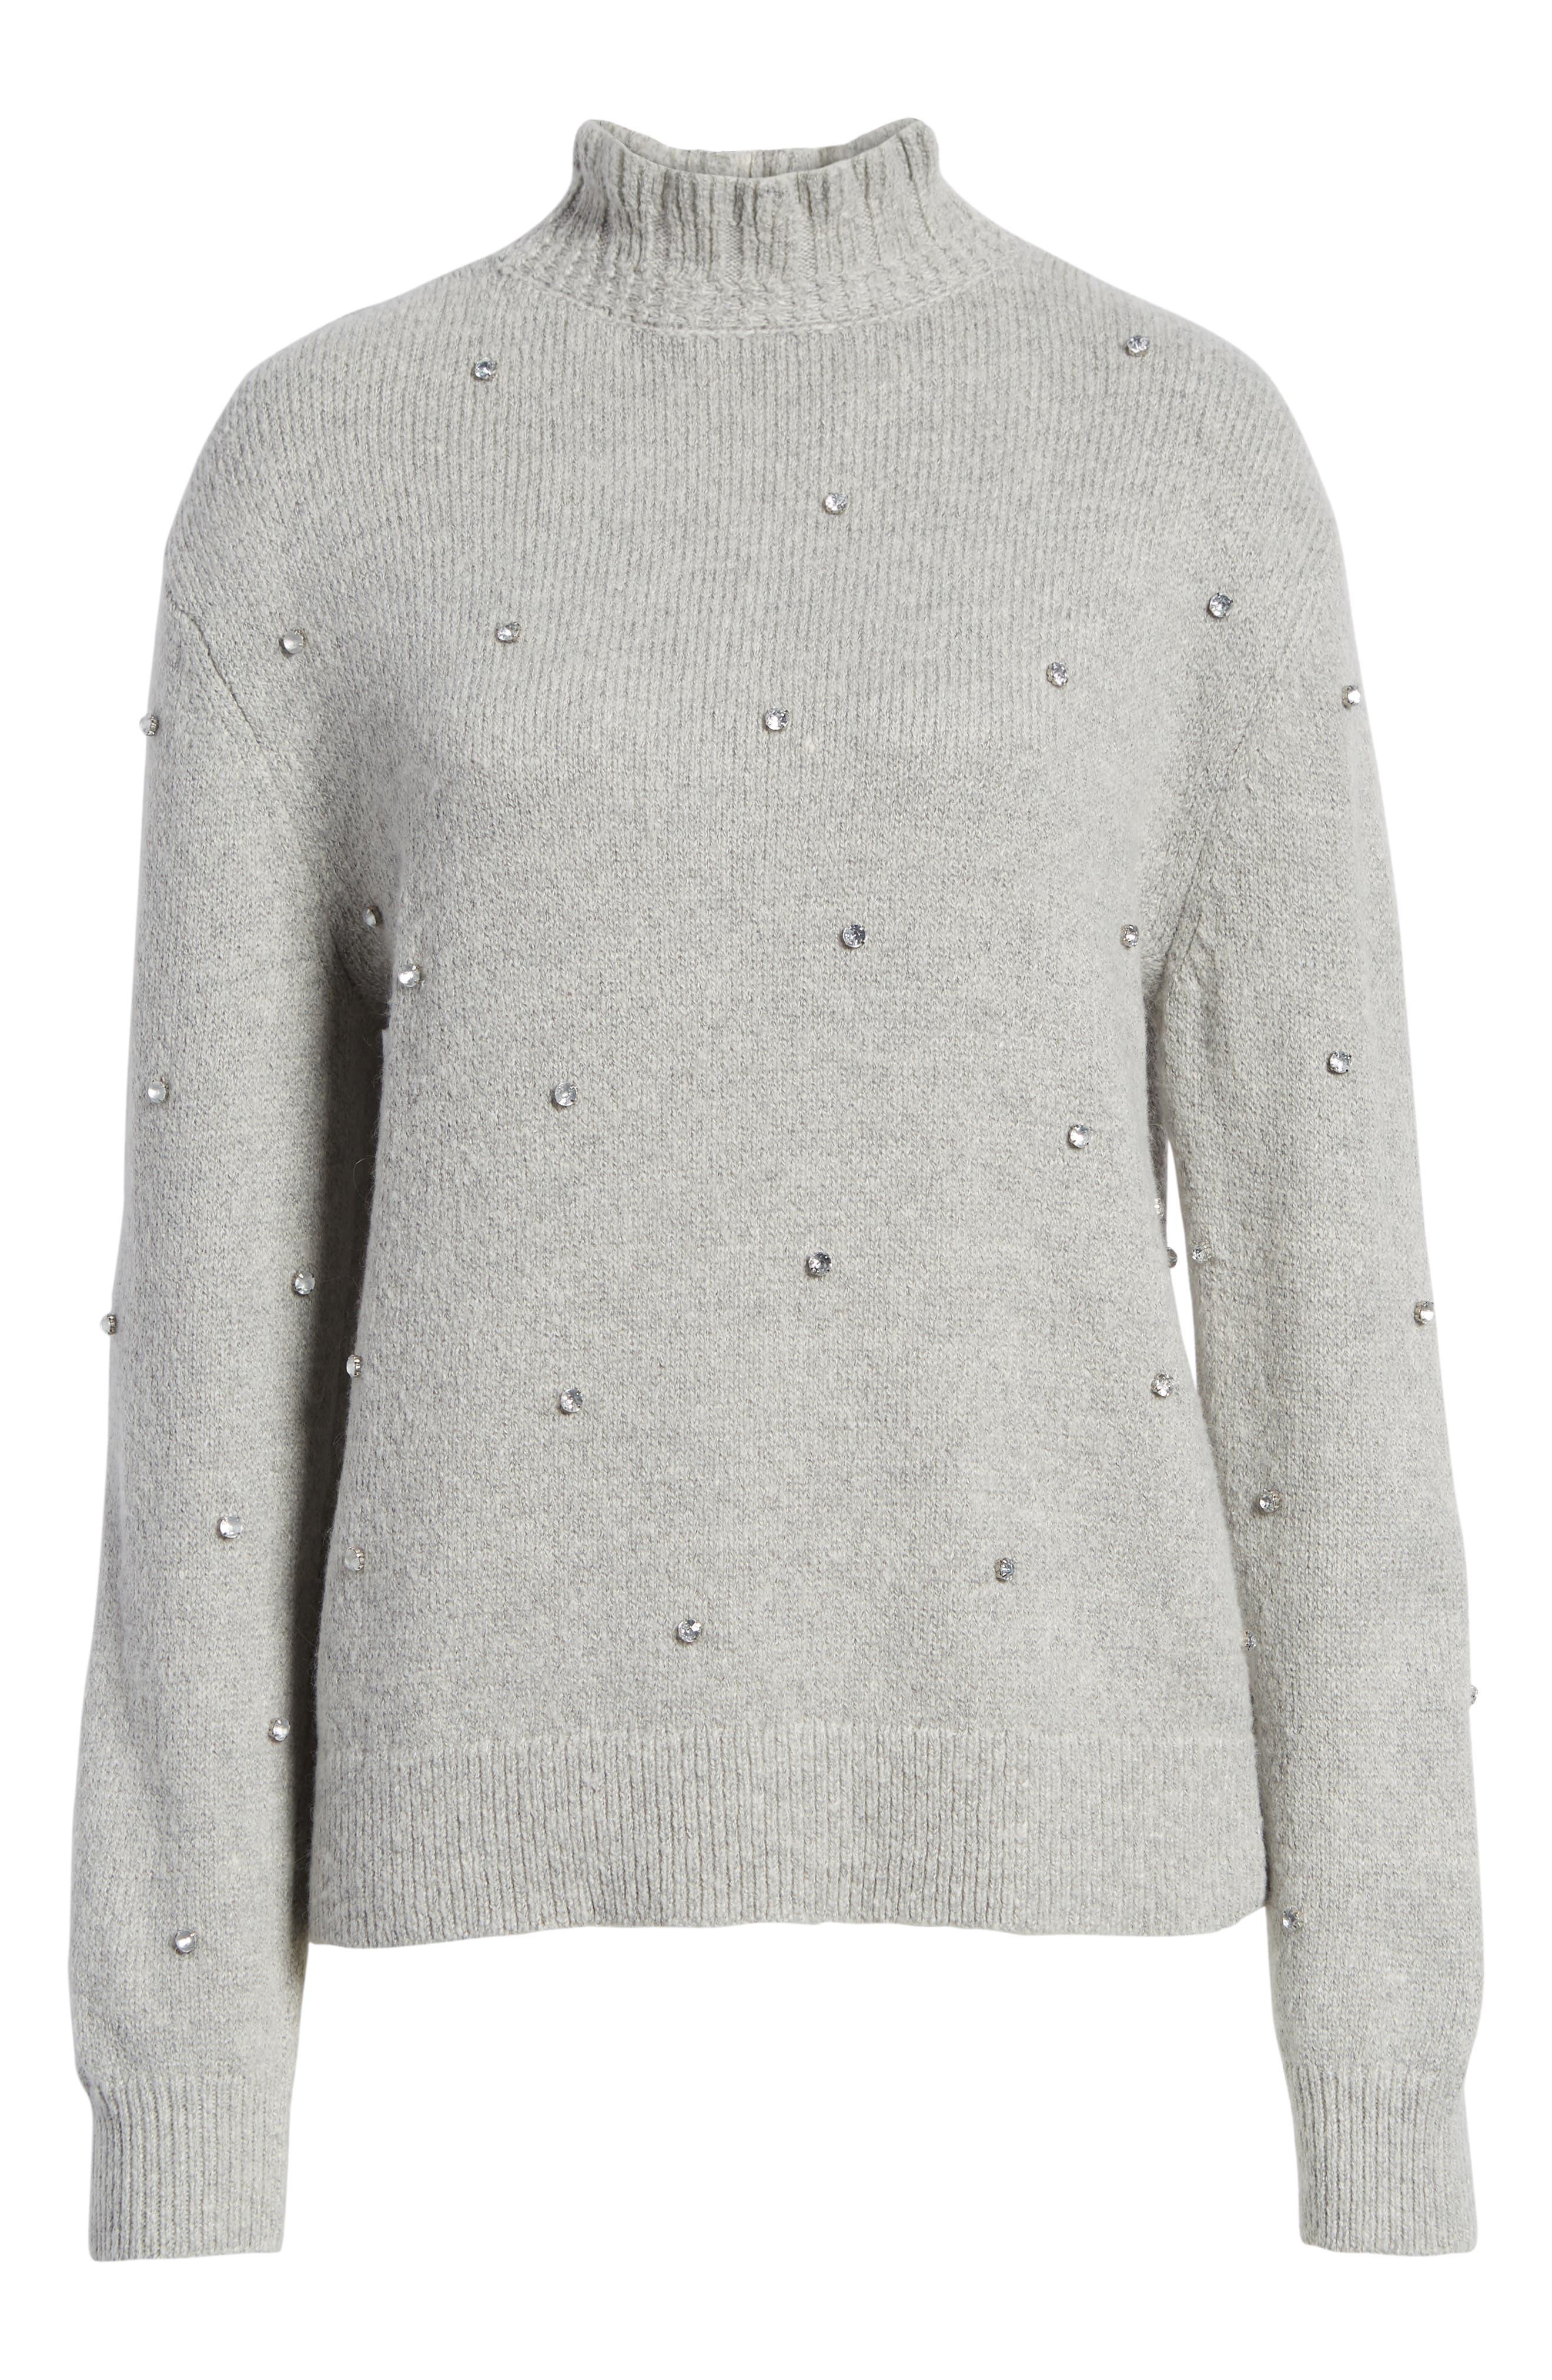 Embellished Ruffle Neck Sweater,                             Alternate thumbnail 6, color,                             GREY LIGHT HEATHER